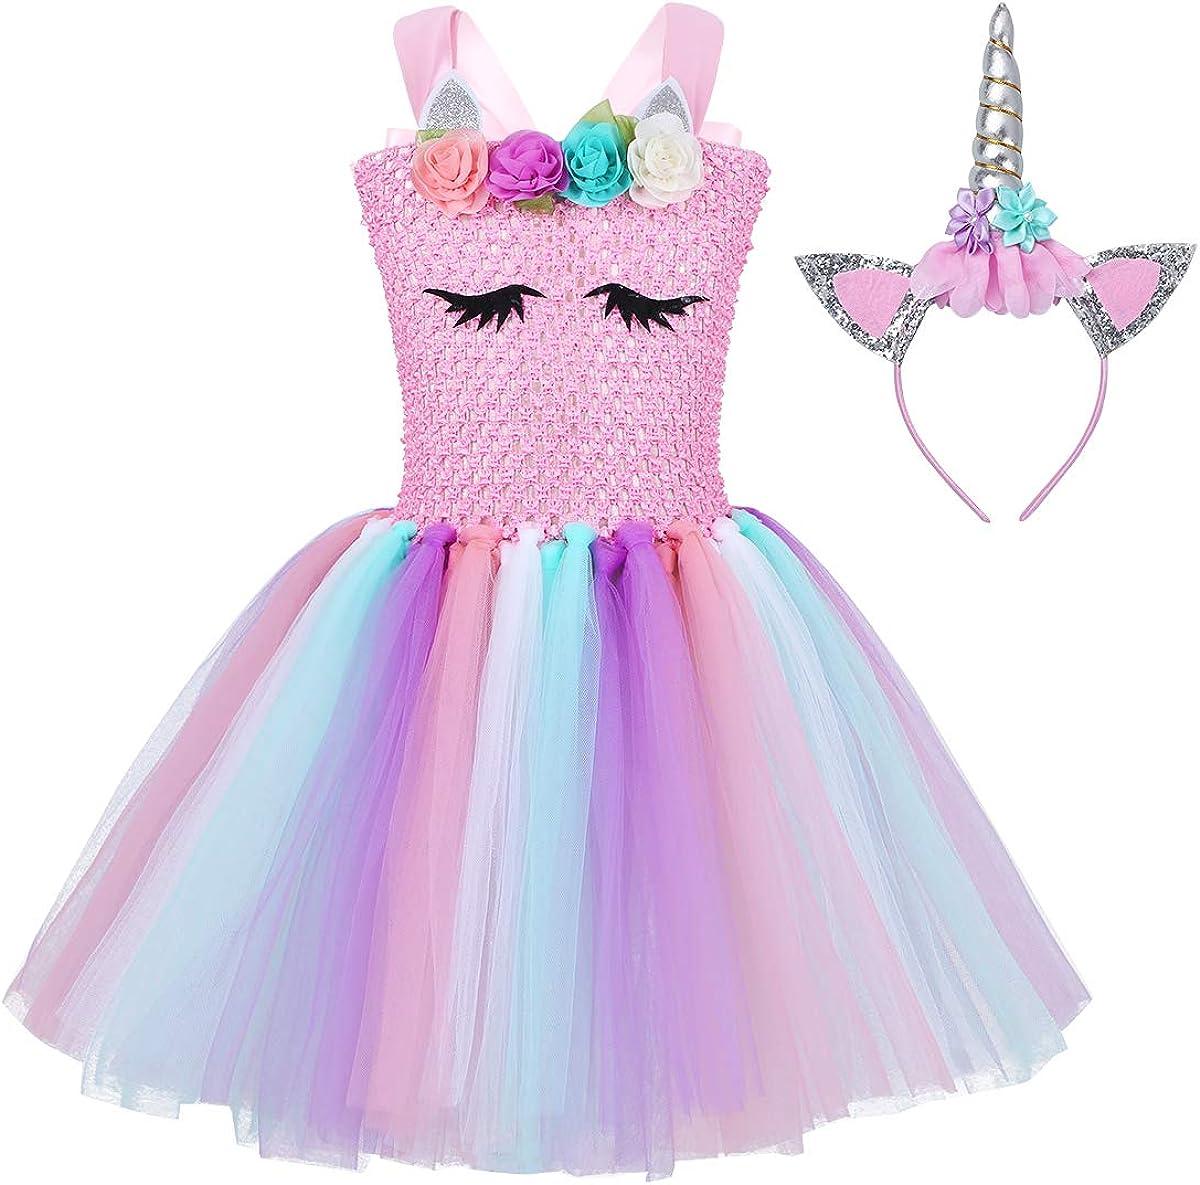 Girl Kid Tutu Rainbow Dress Up Princess Hair Hoop Outfit  Cosplay Fancy Costumes